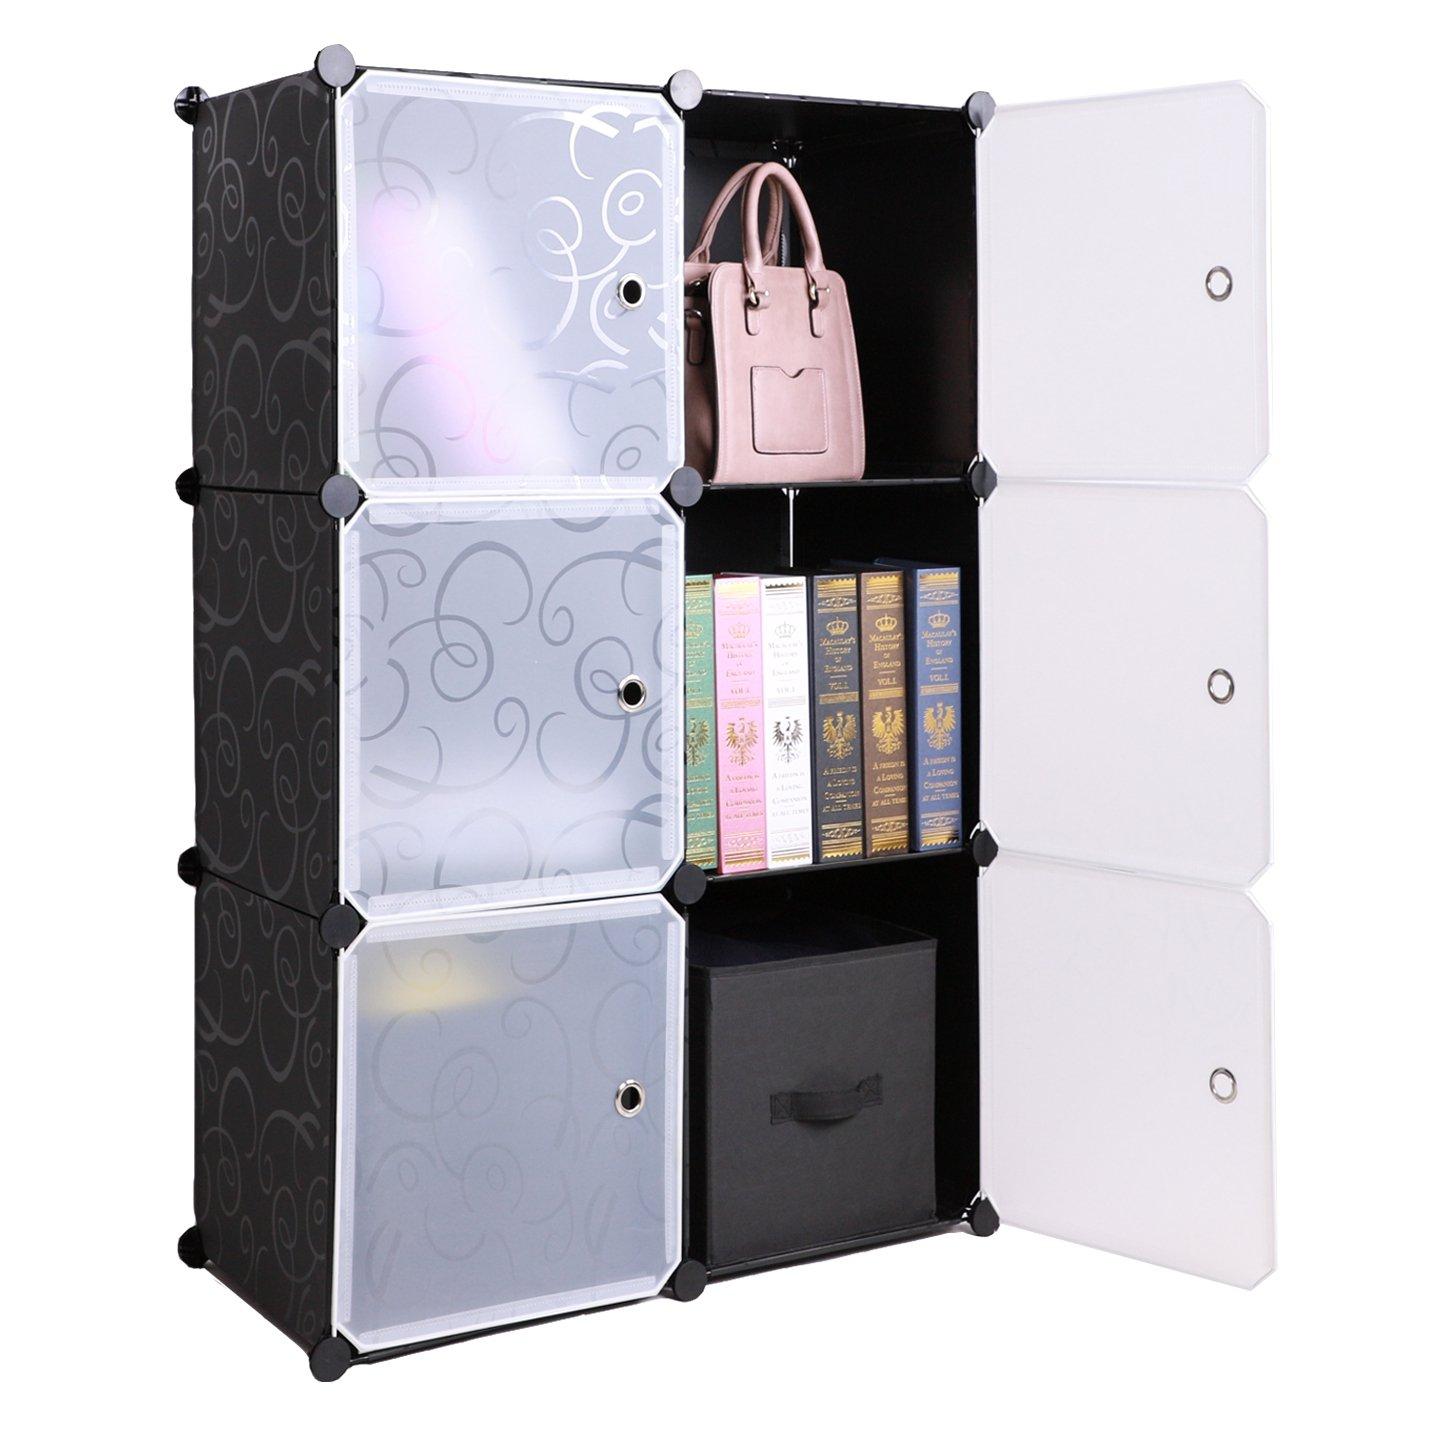 BASTUO 6-Cube DIY Storage Cube Organizer 3-Tier Storage Cube Cabinet Bookcase Shelves Organizer Closet with Door